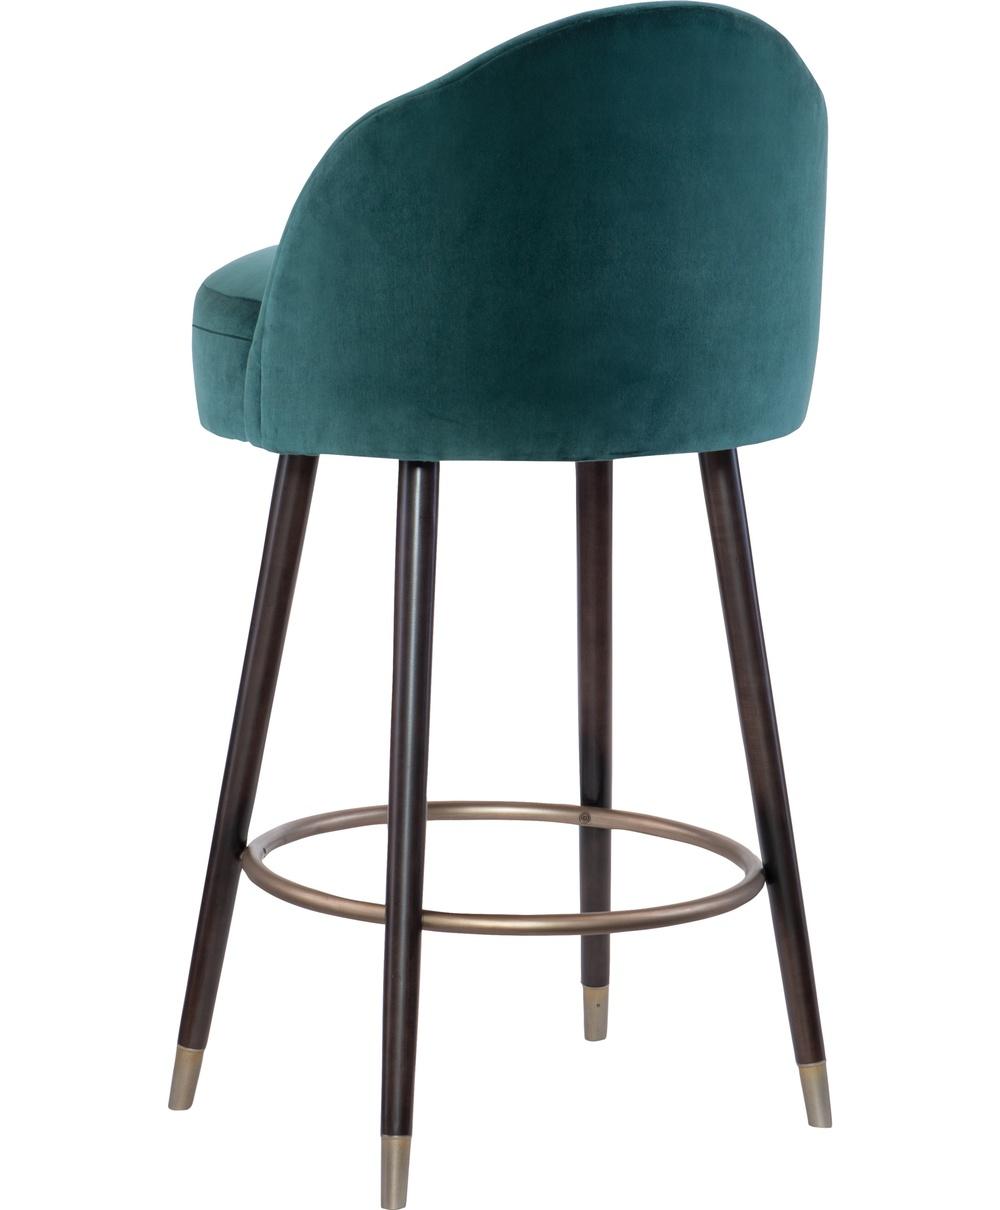 Hickory Chair - Helga Bar Stool